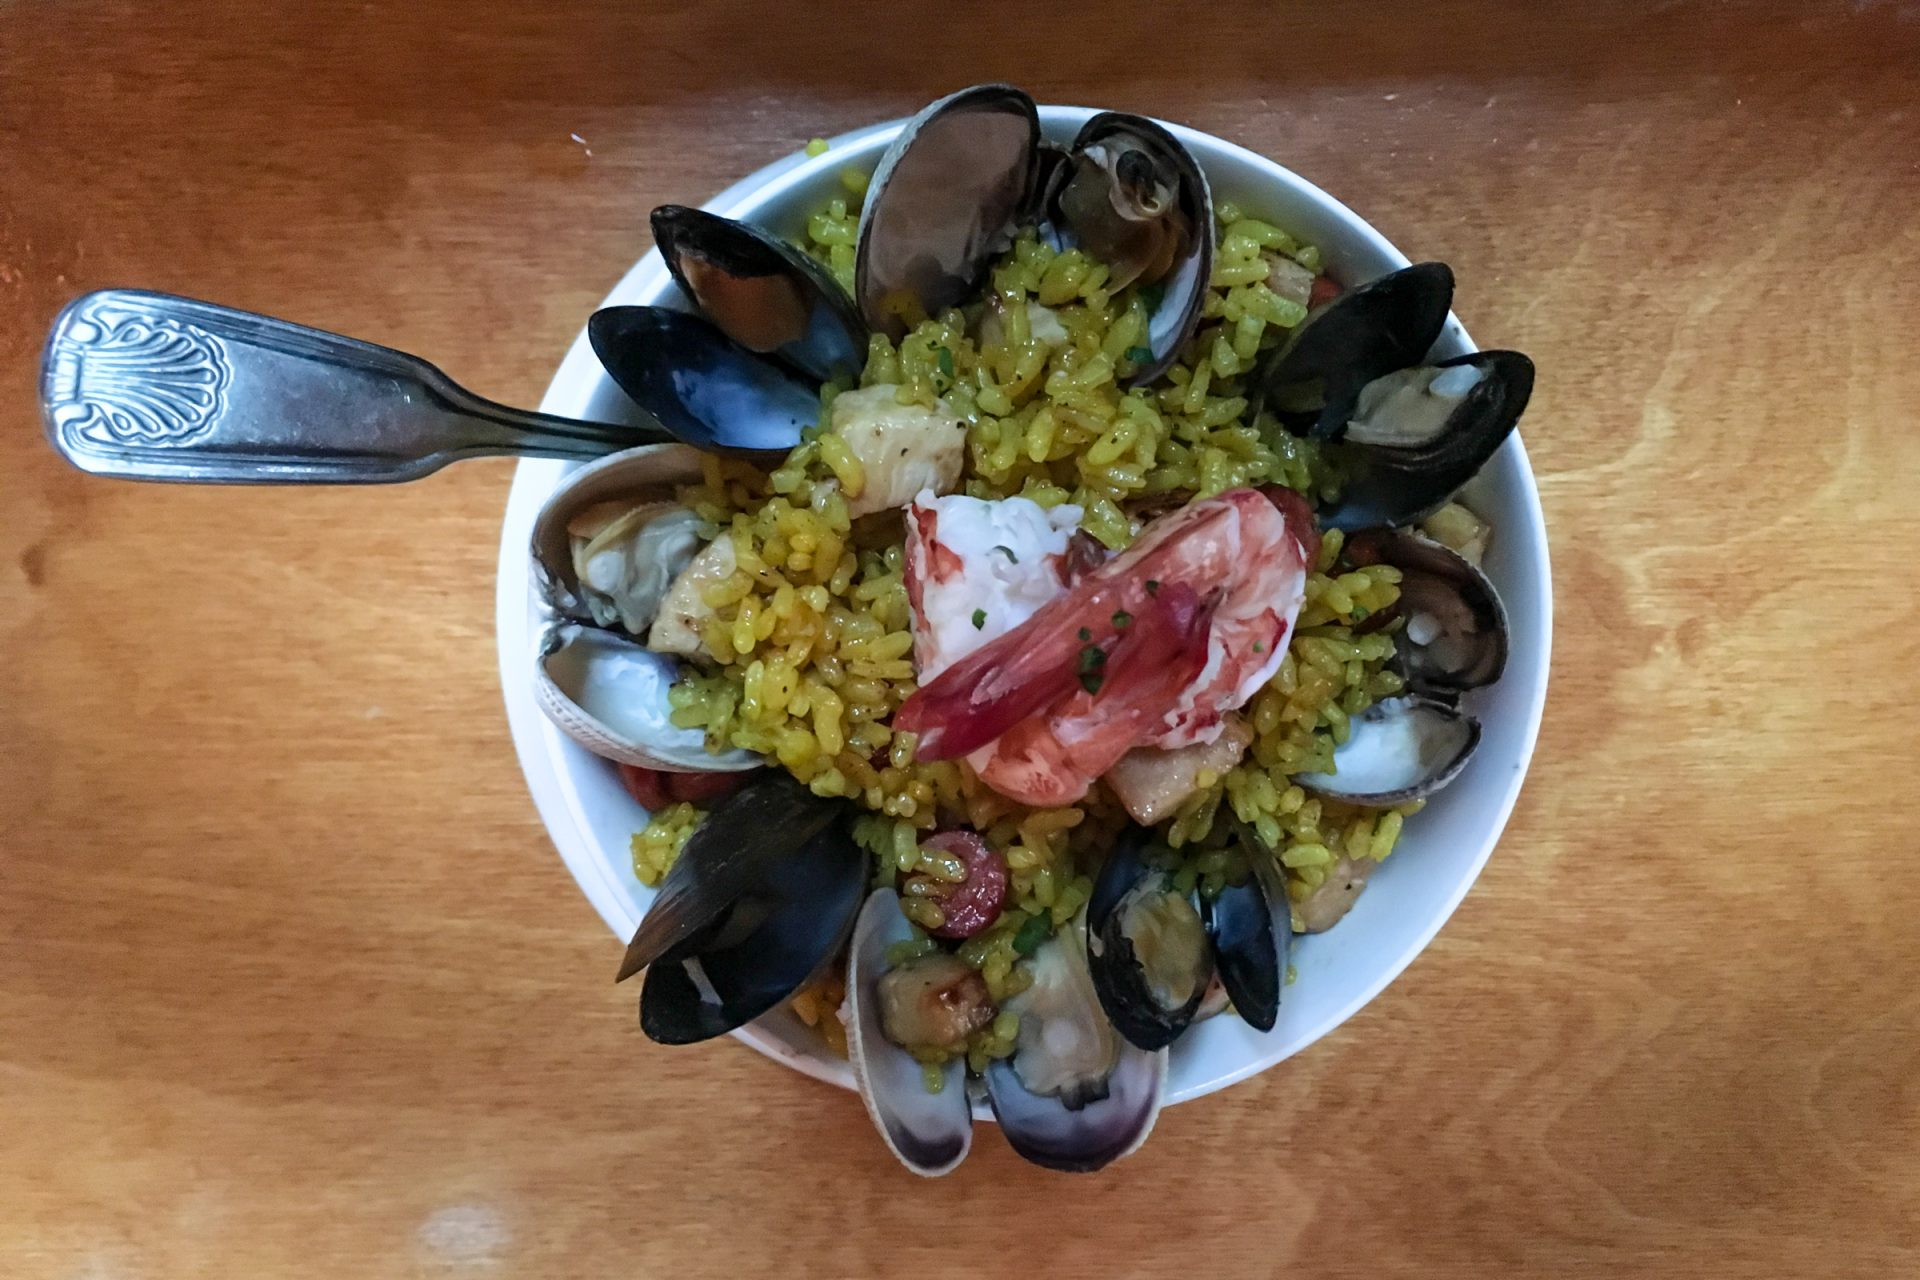 Seafood & Rice Bowl on Wood Table